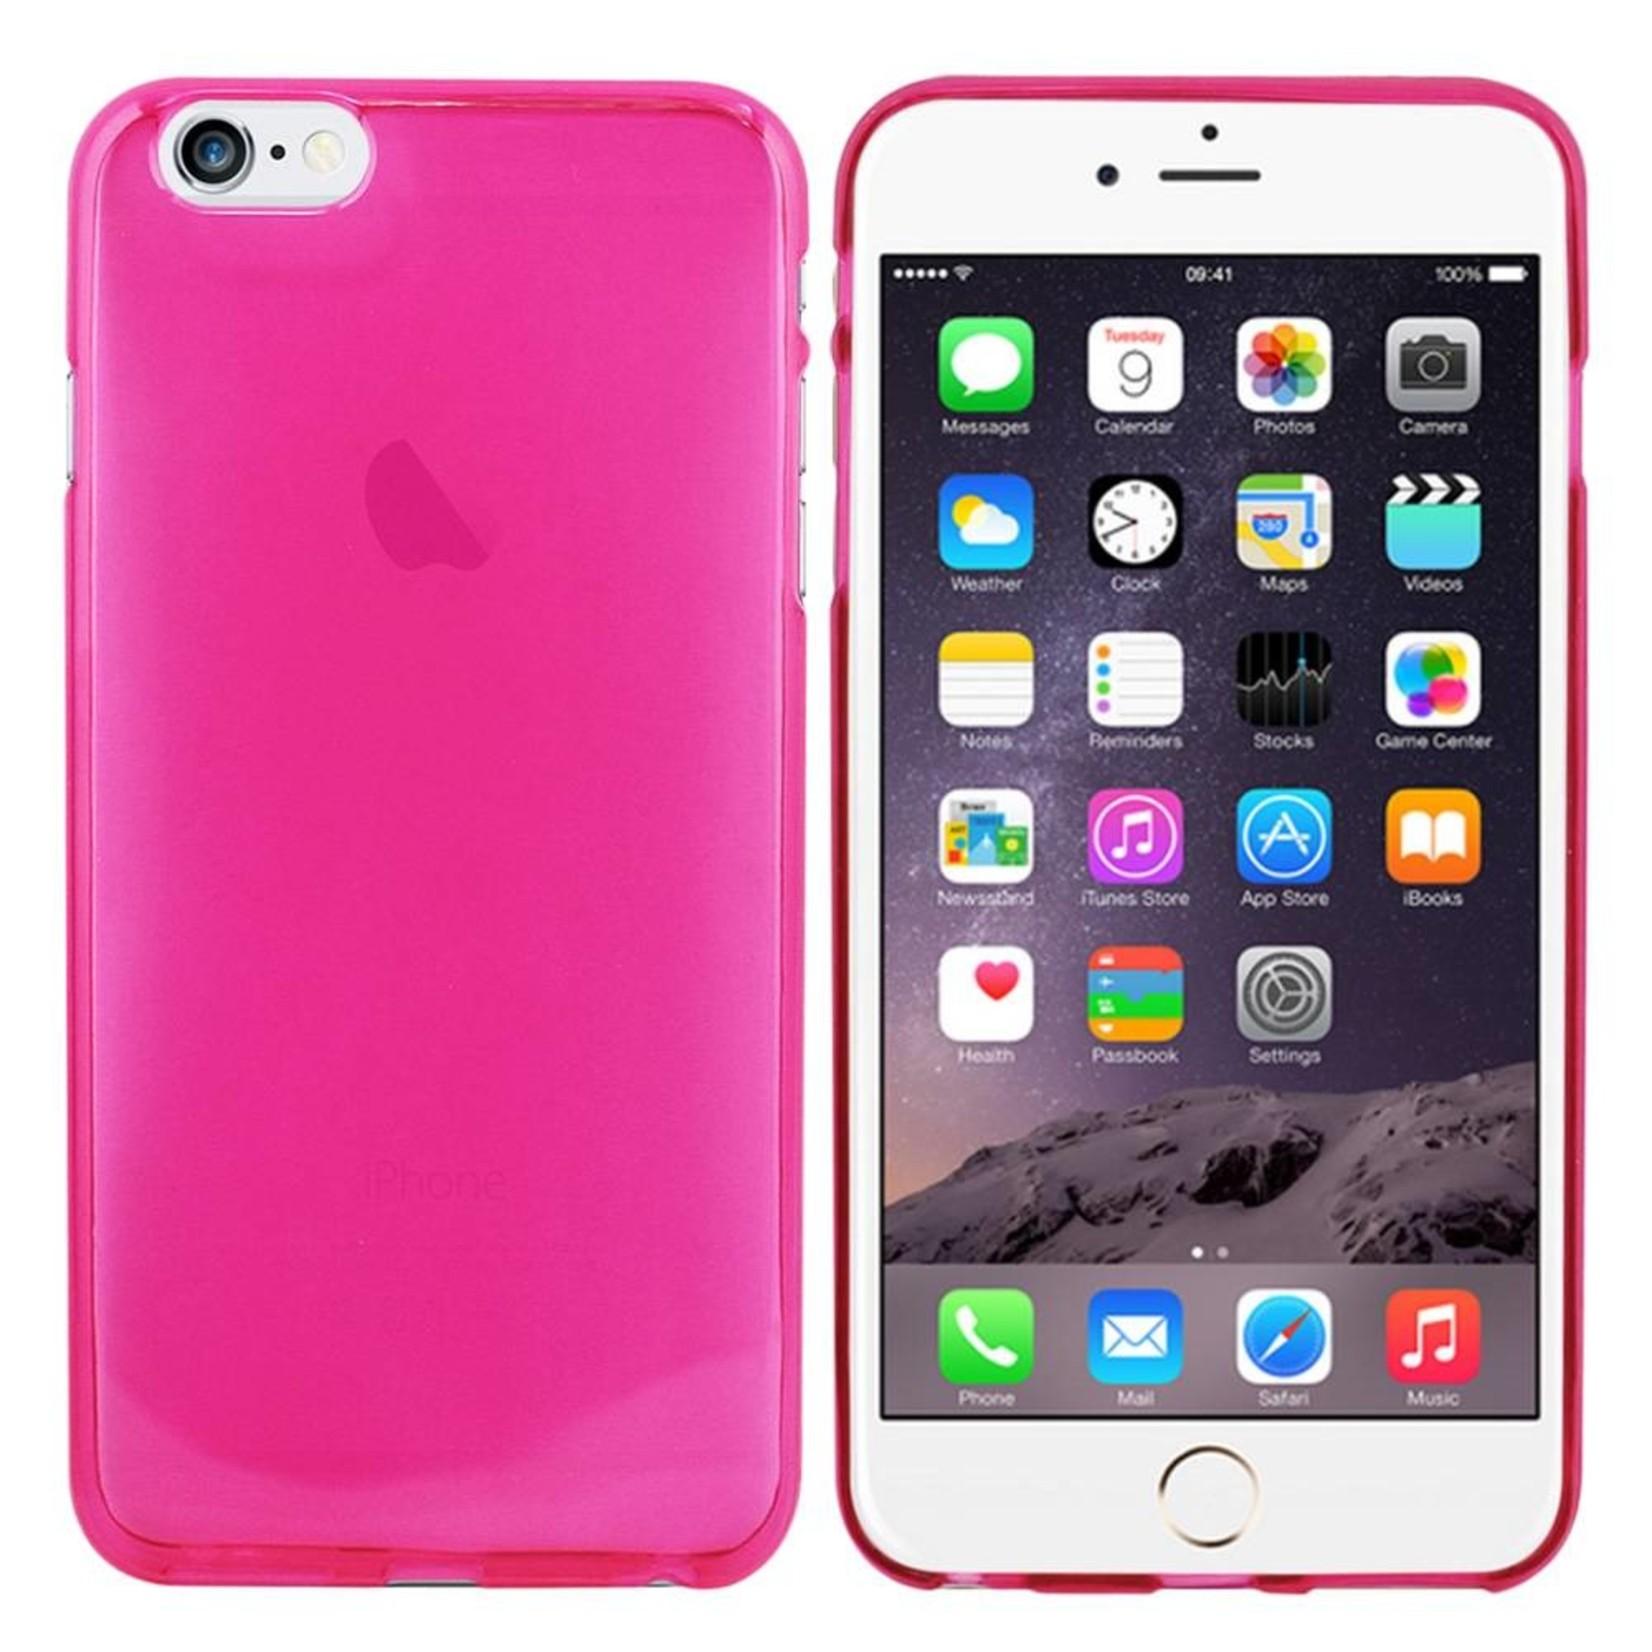 Colorfone Hoesje CoolSkin3T voor Apple iPhone 6 Plus Tr. D. Roze